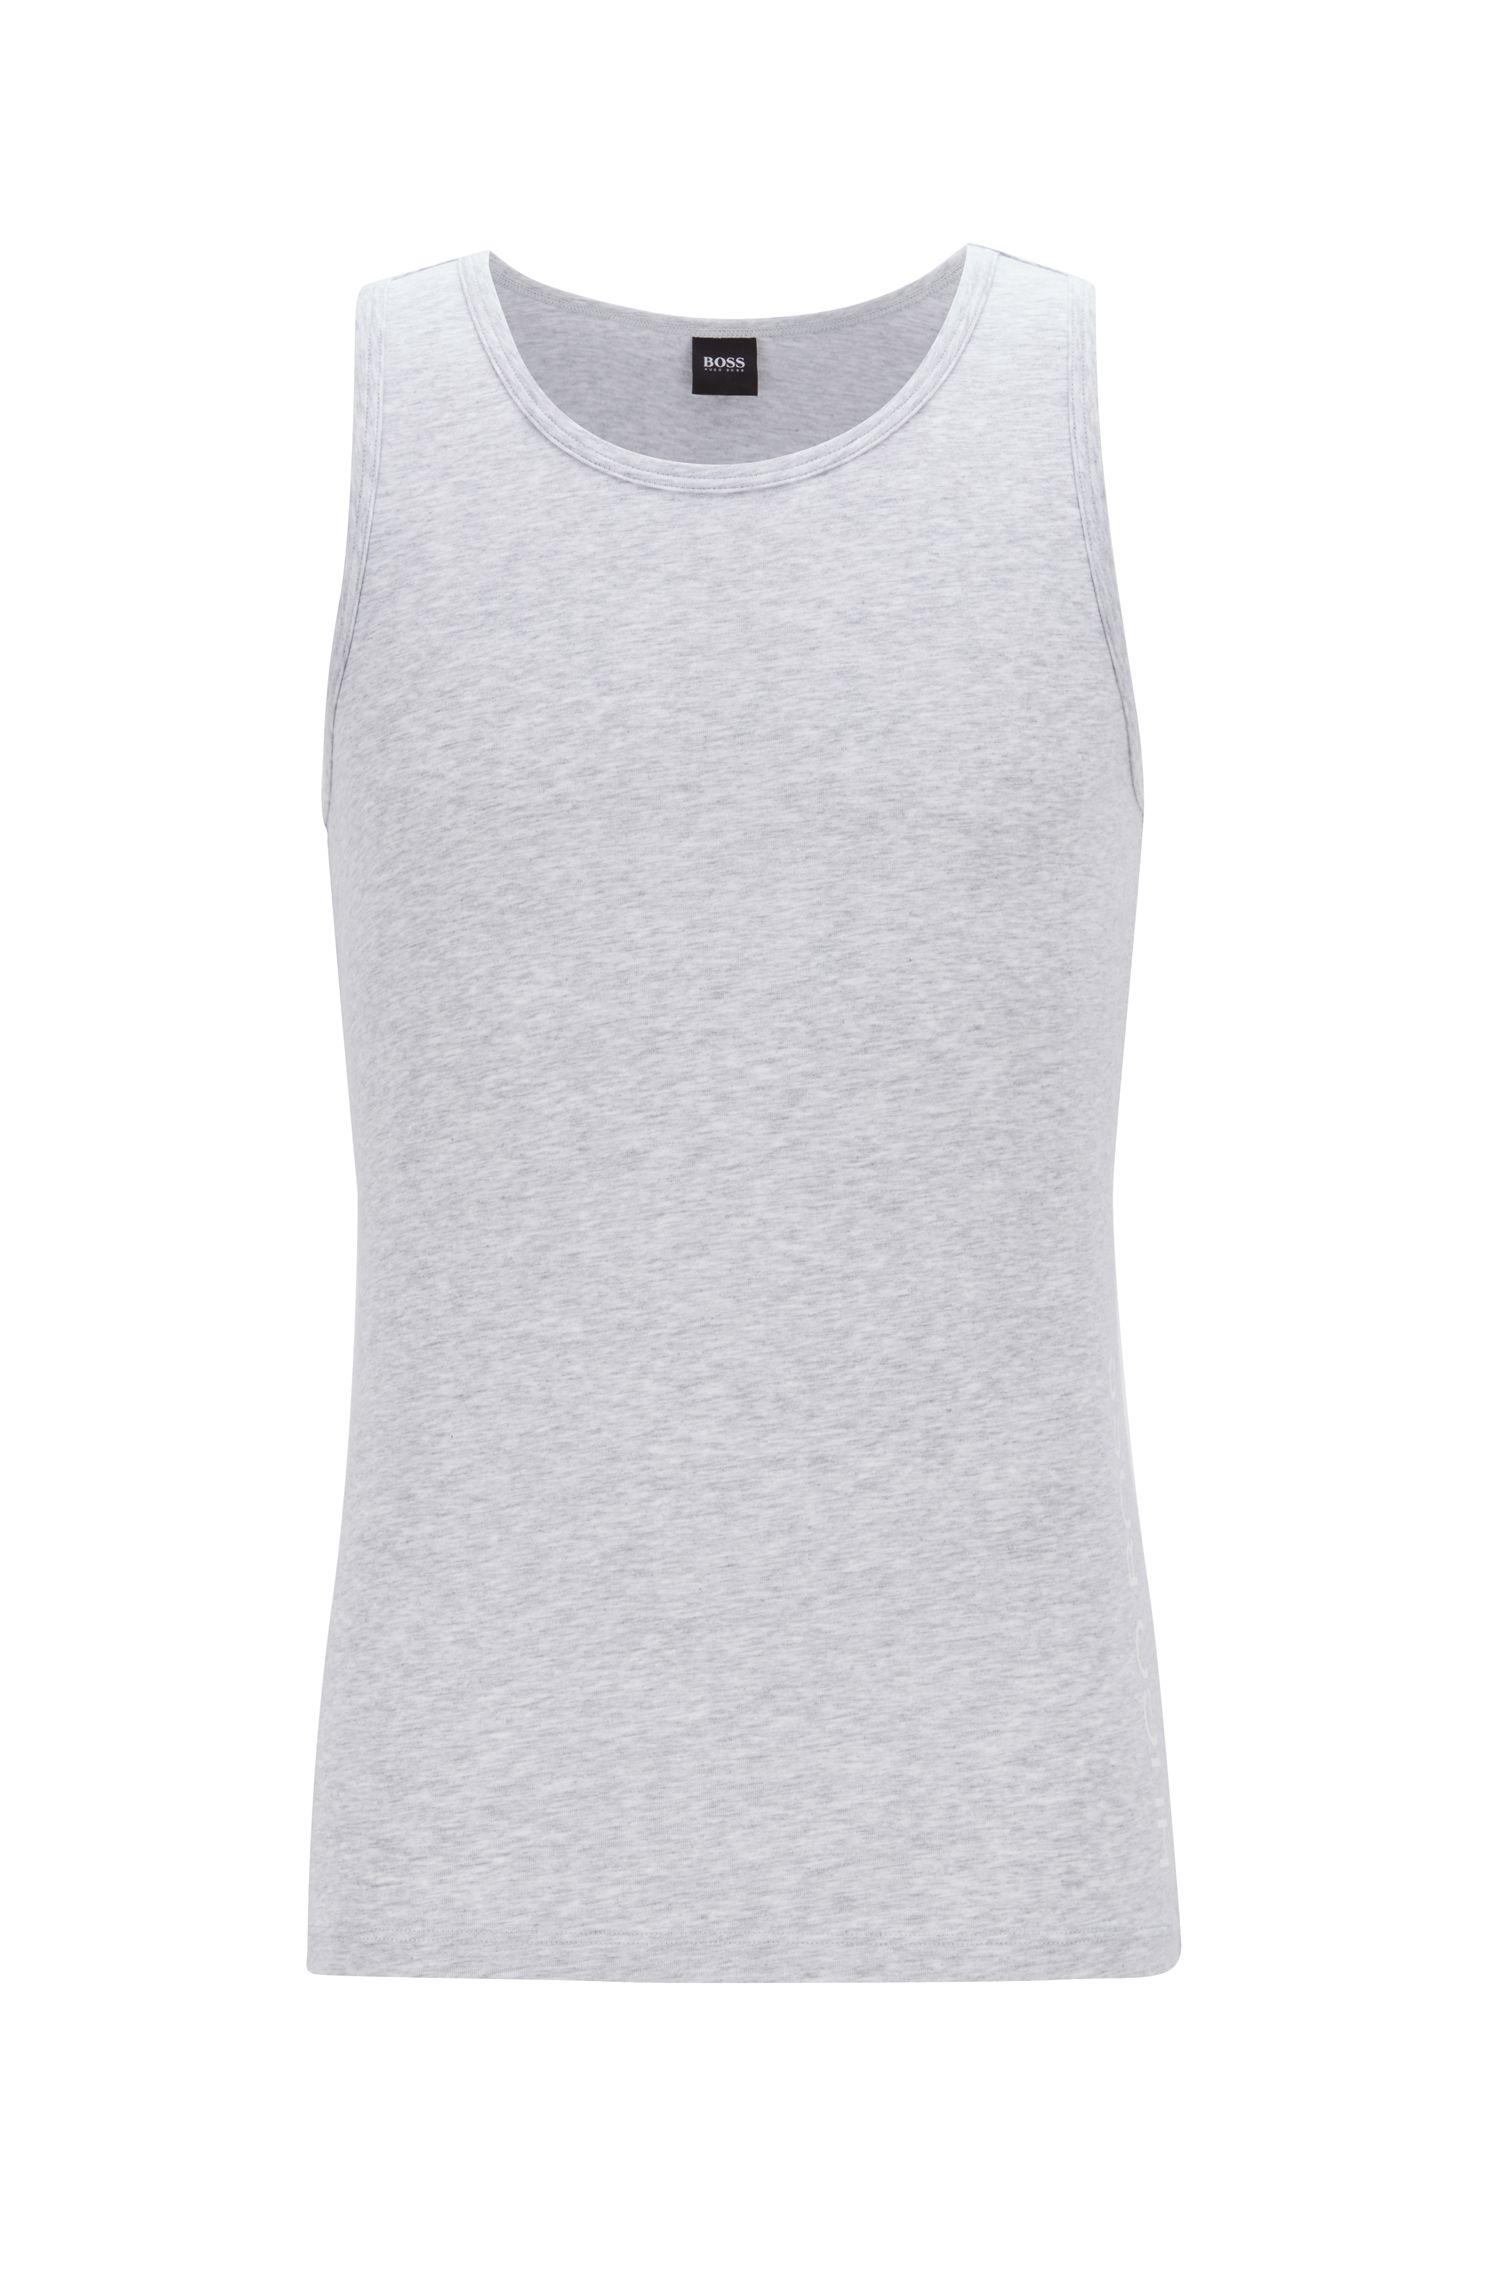 Slim-fit underwear vest with contrast cut-logo print, Silver